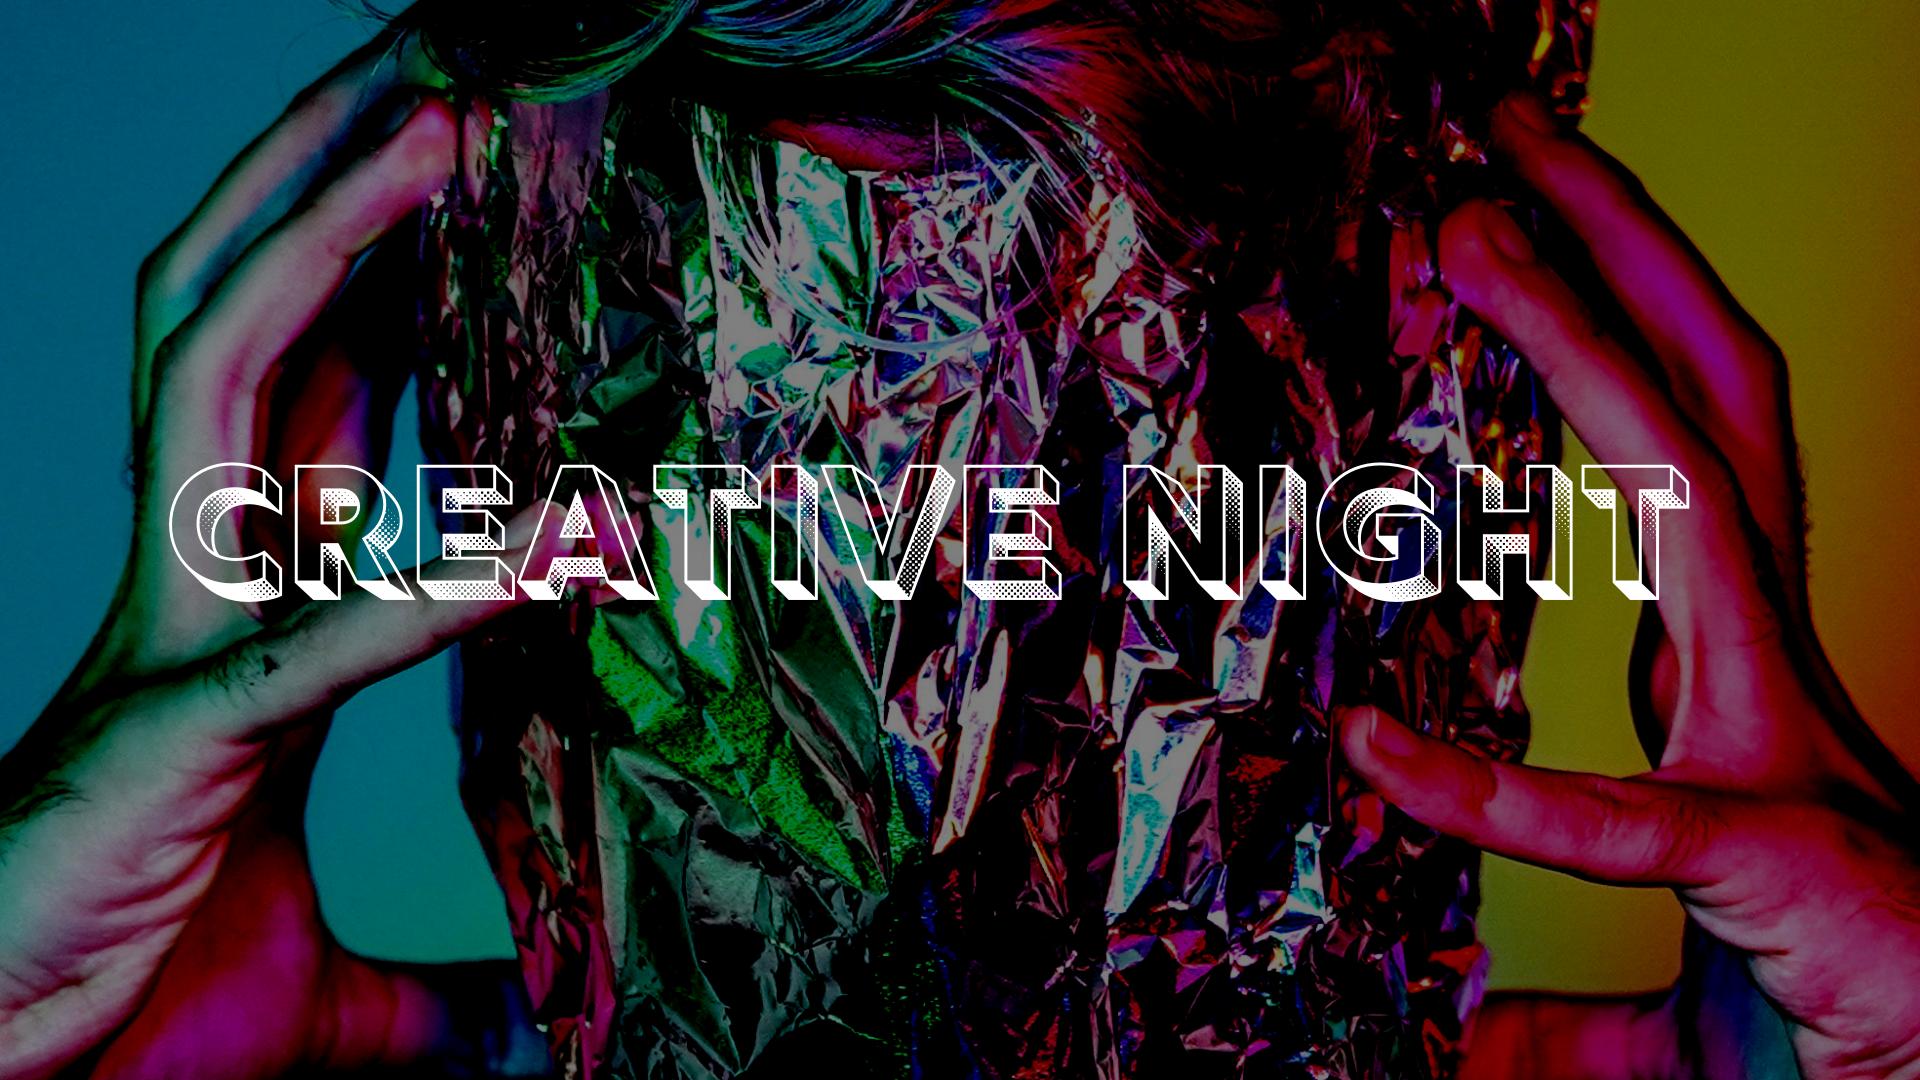 CREATIVE NIGHT (1).png